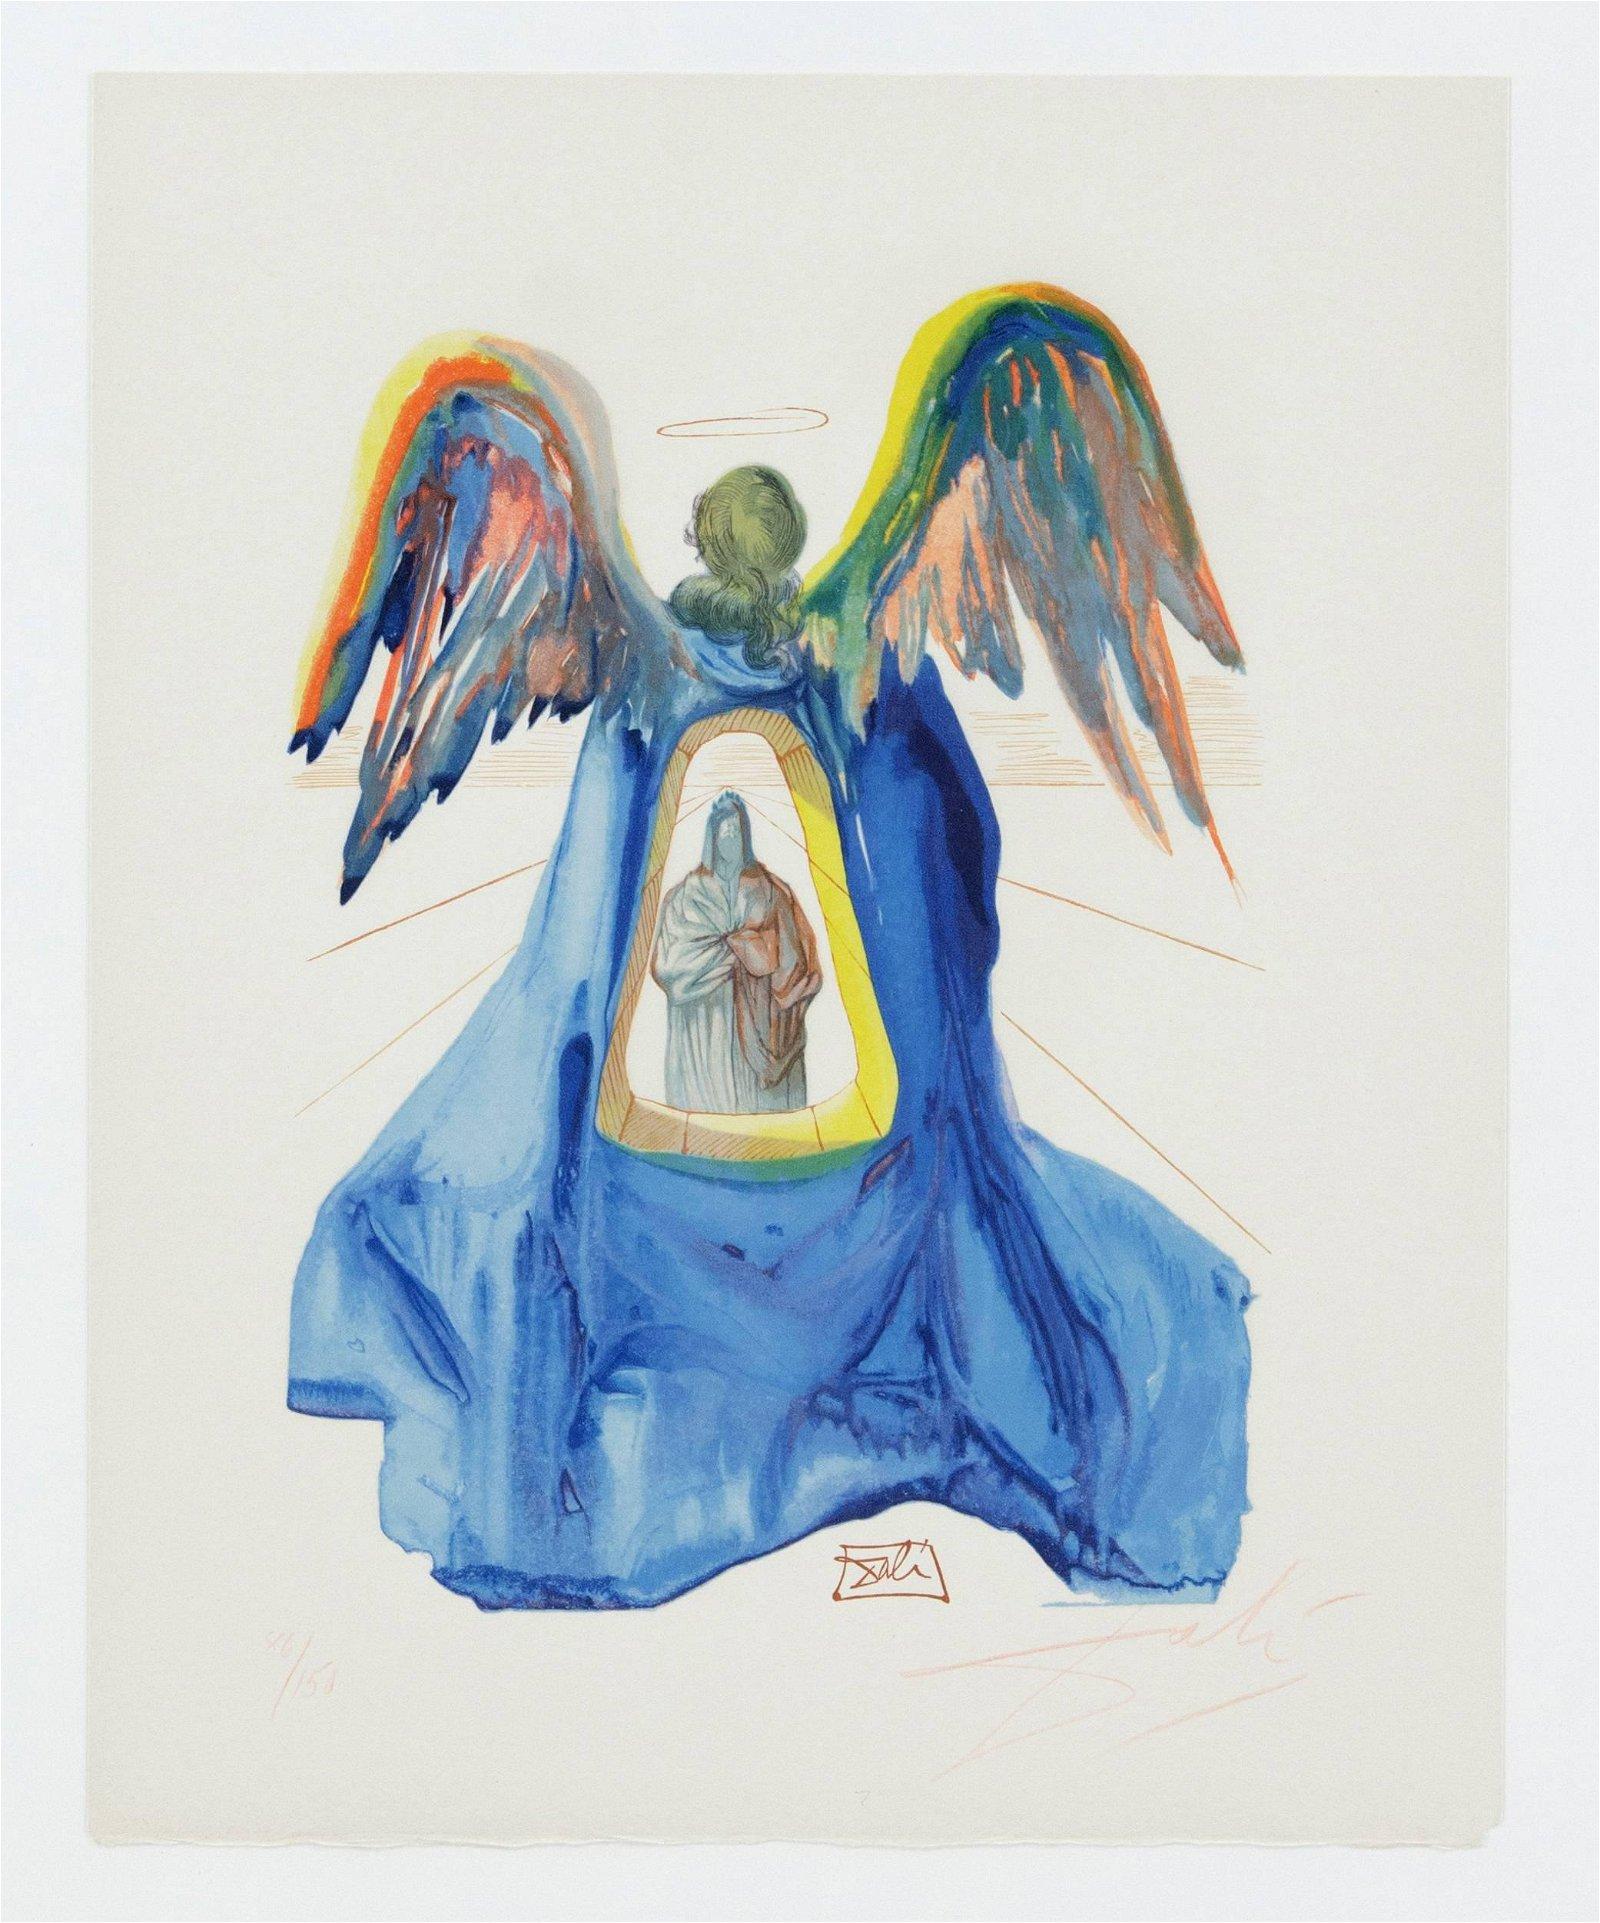 Salvador Dali (1904-1989), col